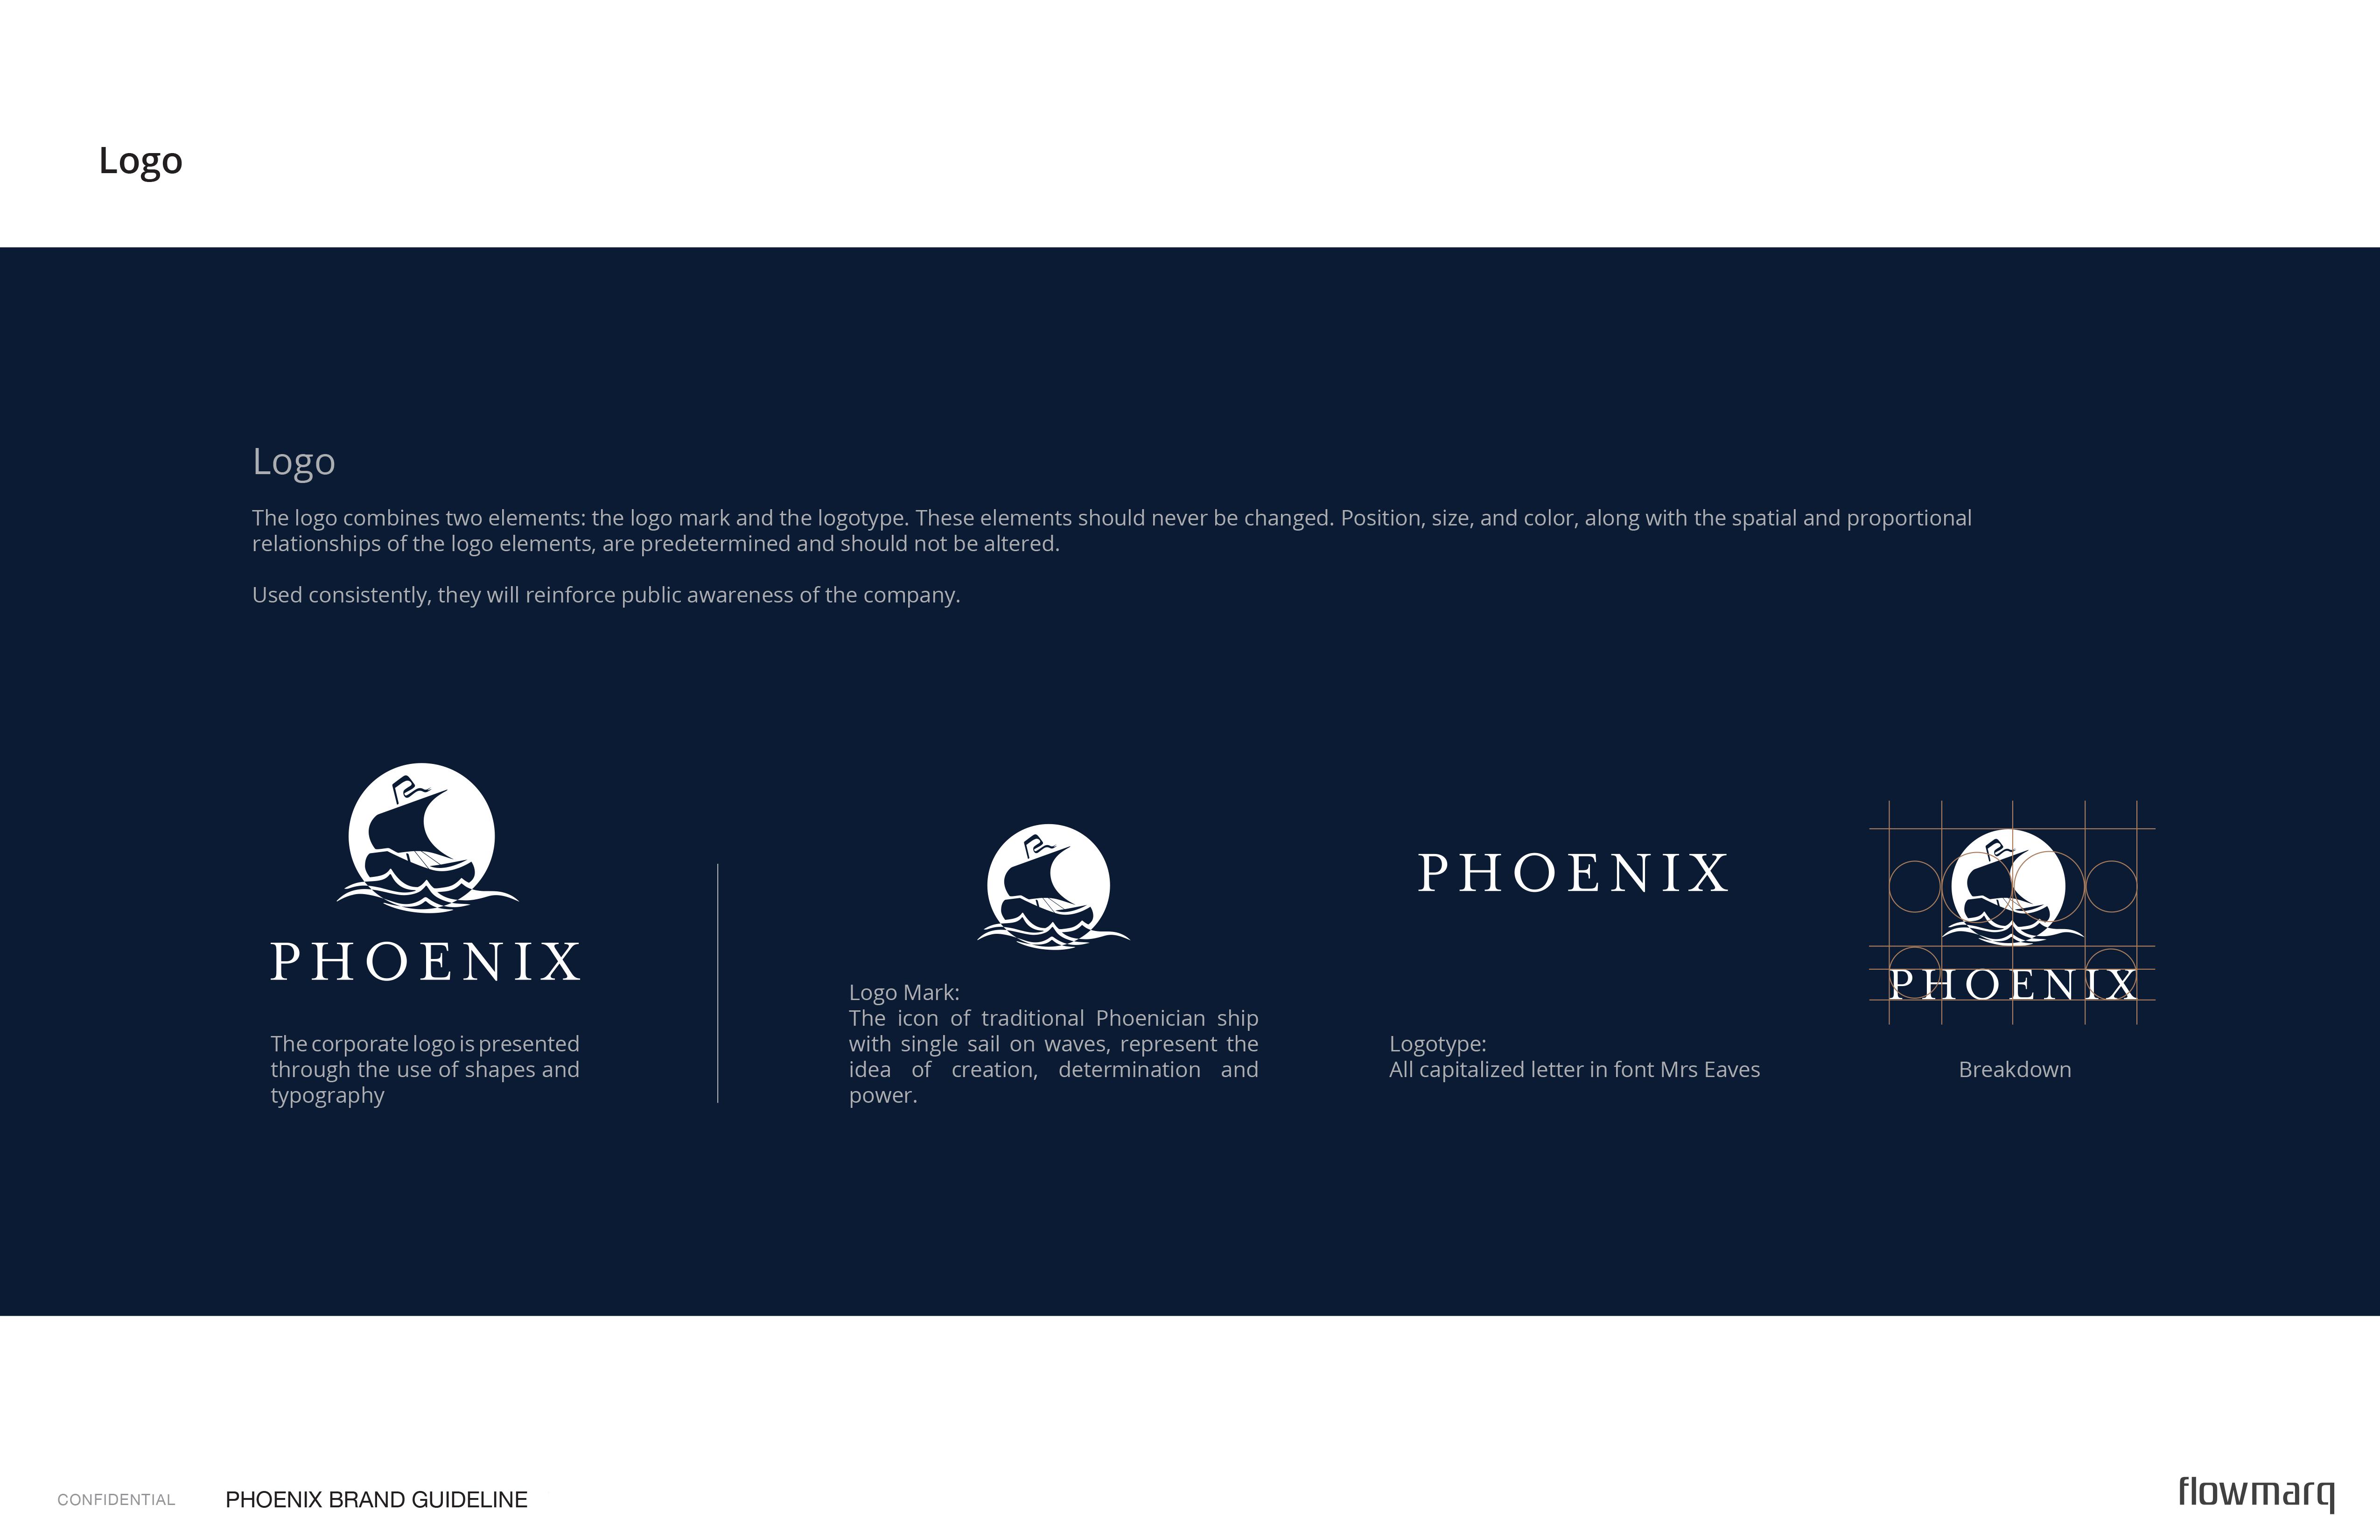 Phoenix - branding guide logo usage